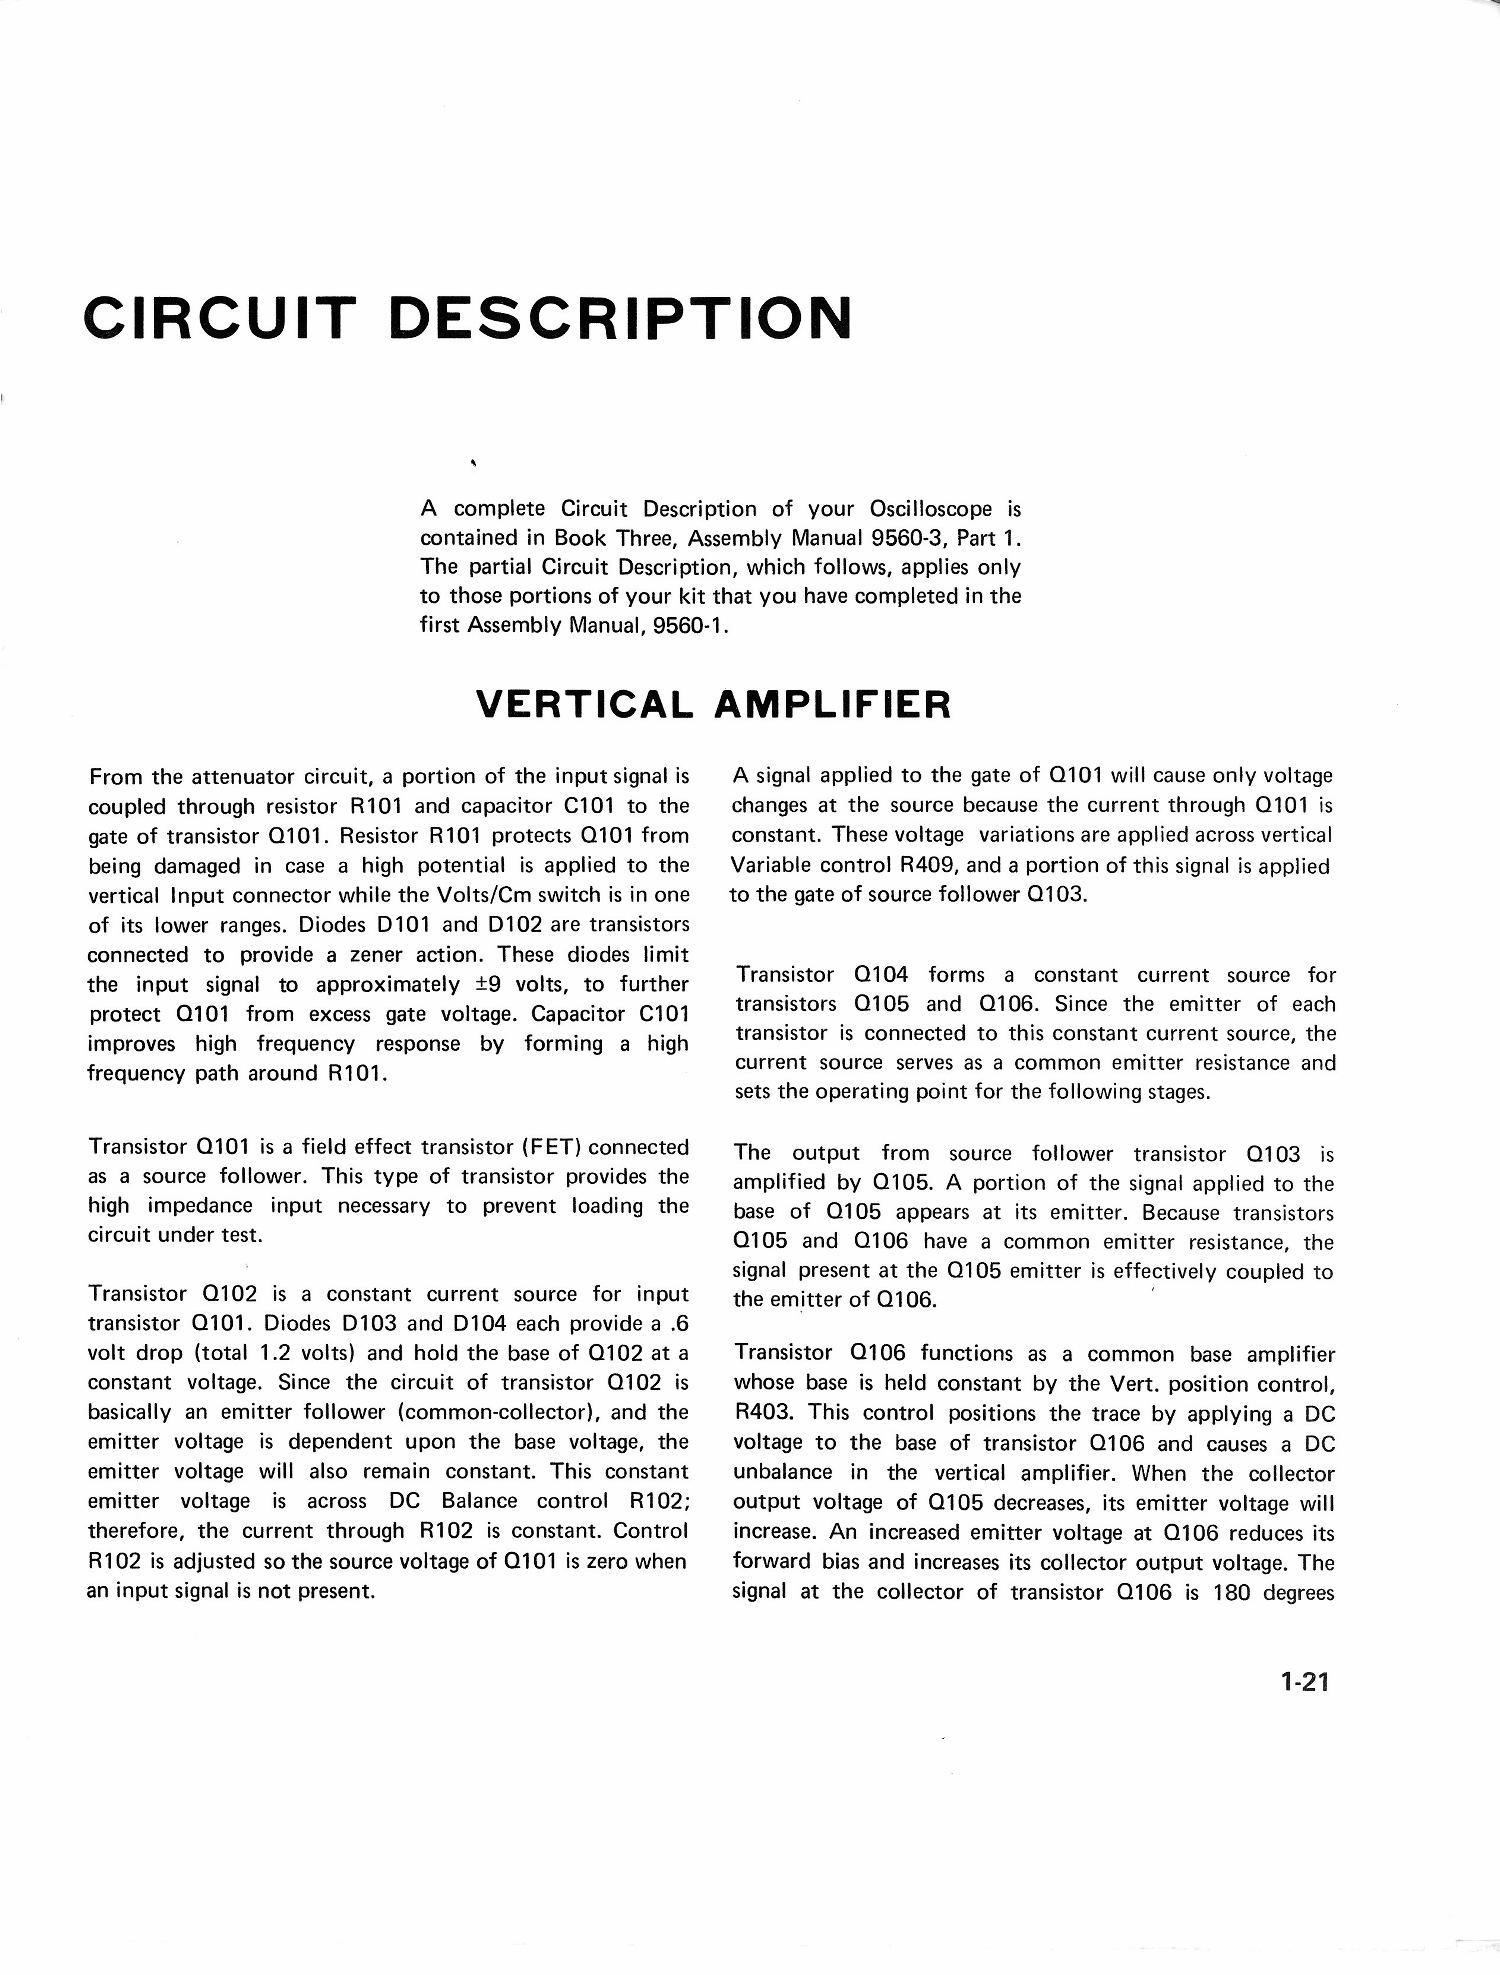 Heath Bell Howell 5 Scope Model 100 203 31 9560 1 Completecircuit1jpg Page Of